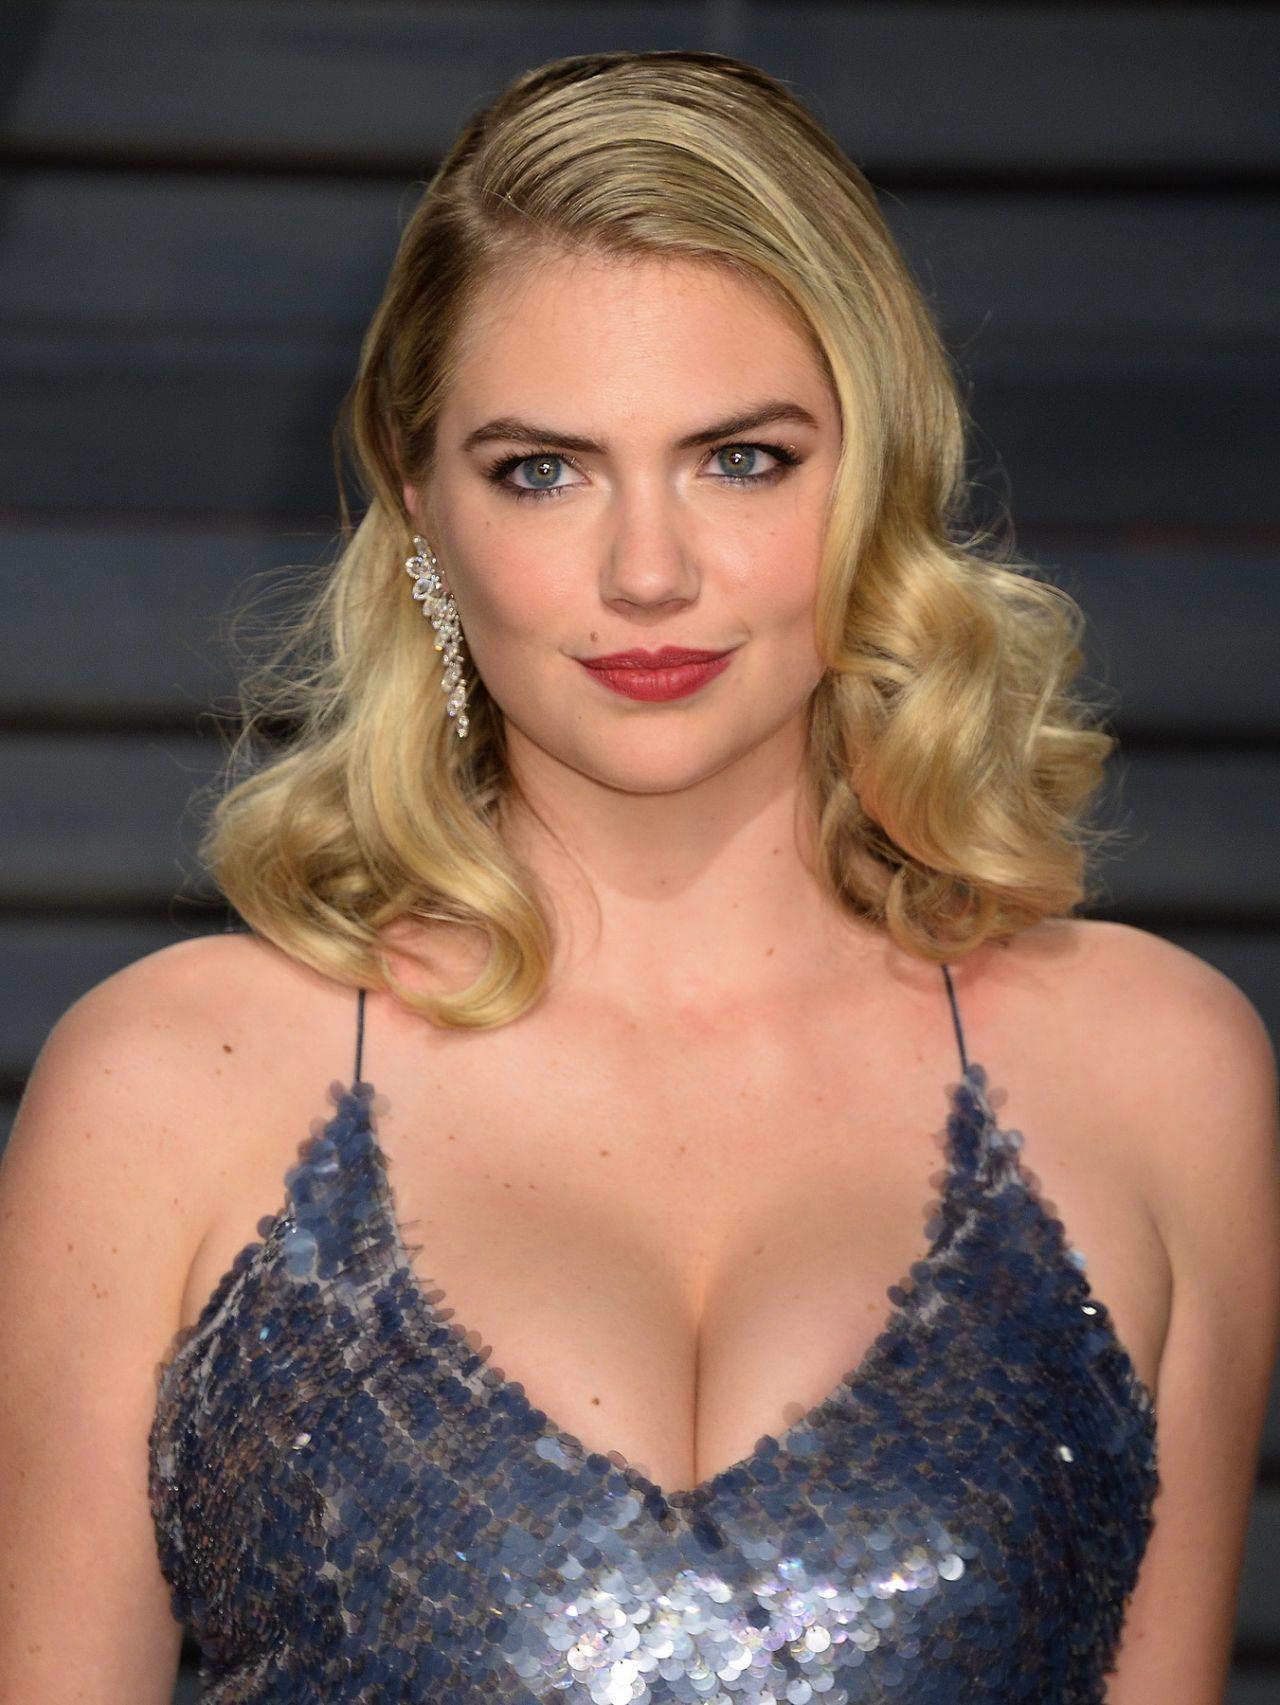 Kate Upton At Vanity Fair Oscar 2017 Party In Los Angeles